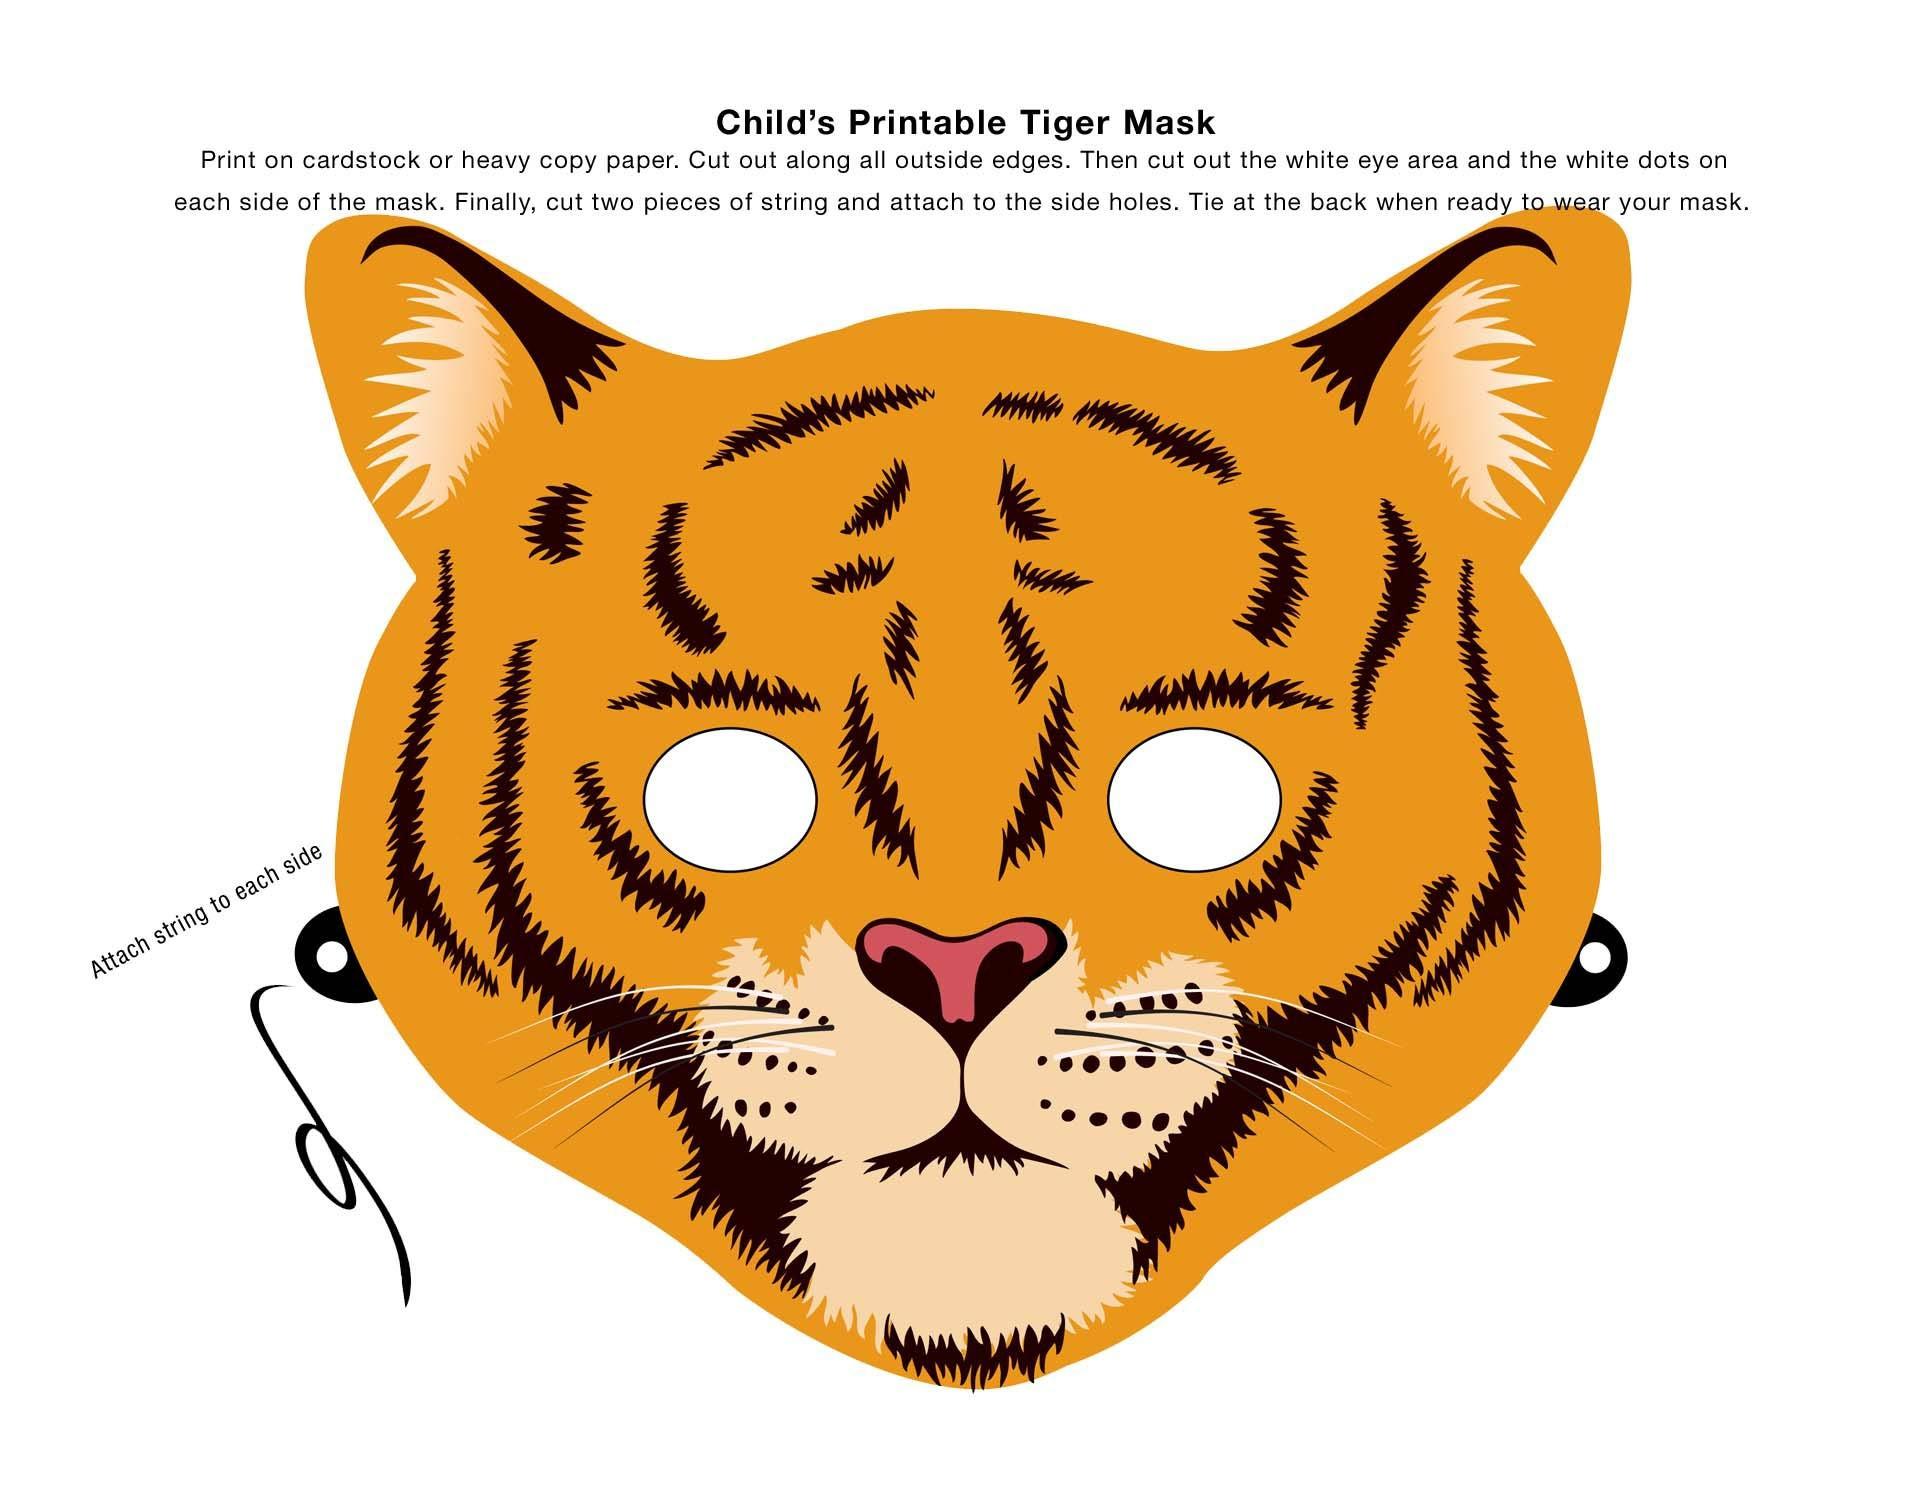 Lion Mask Clipart | Free Download Best Lion Mask Clipart On - Free Printable Lion Mask